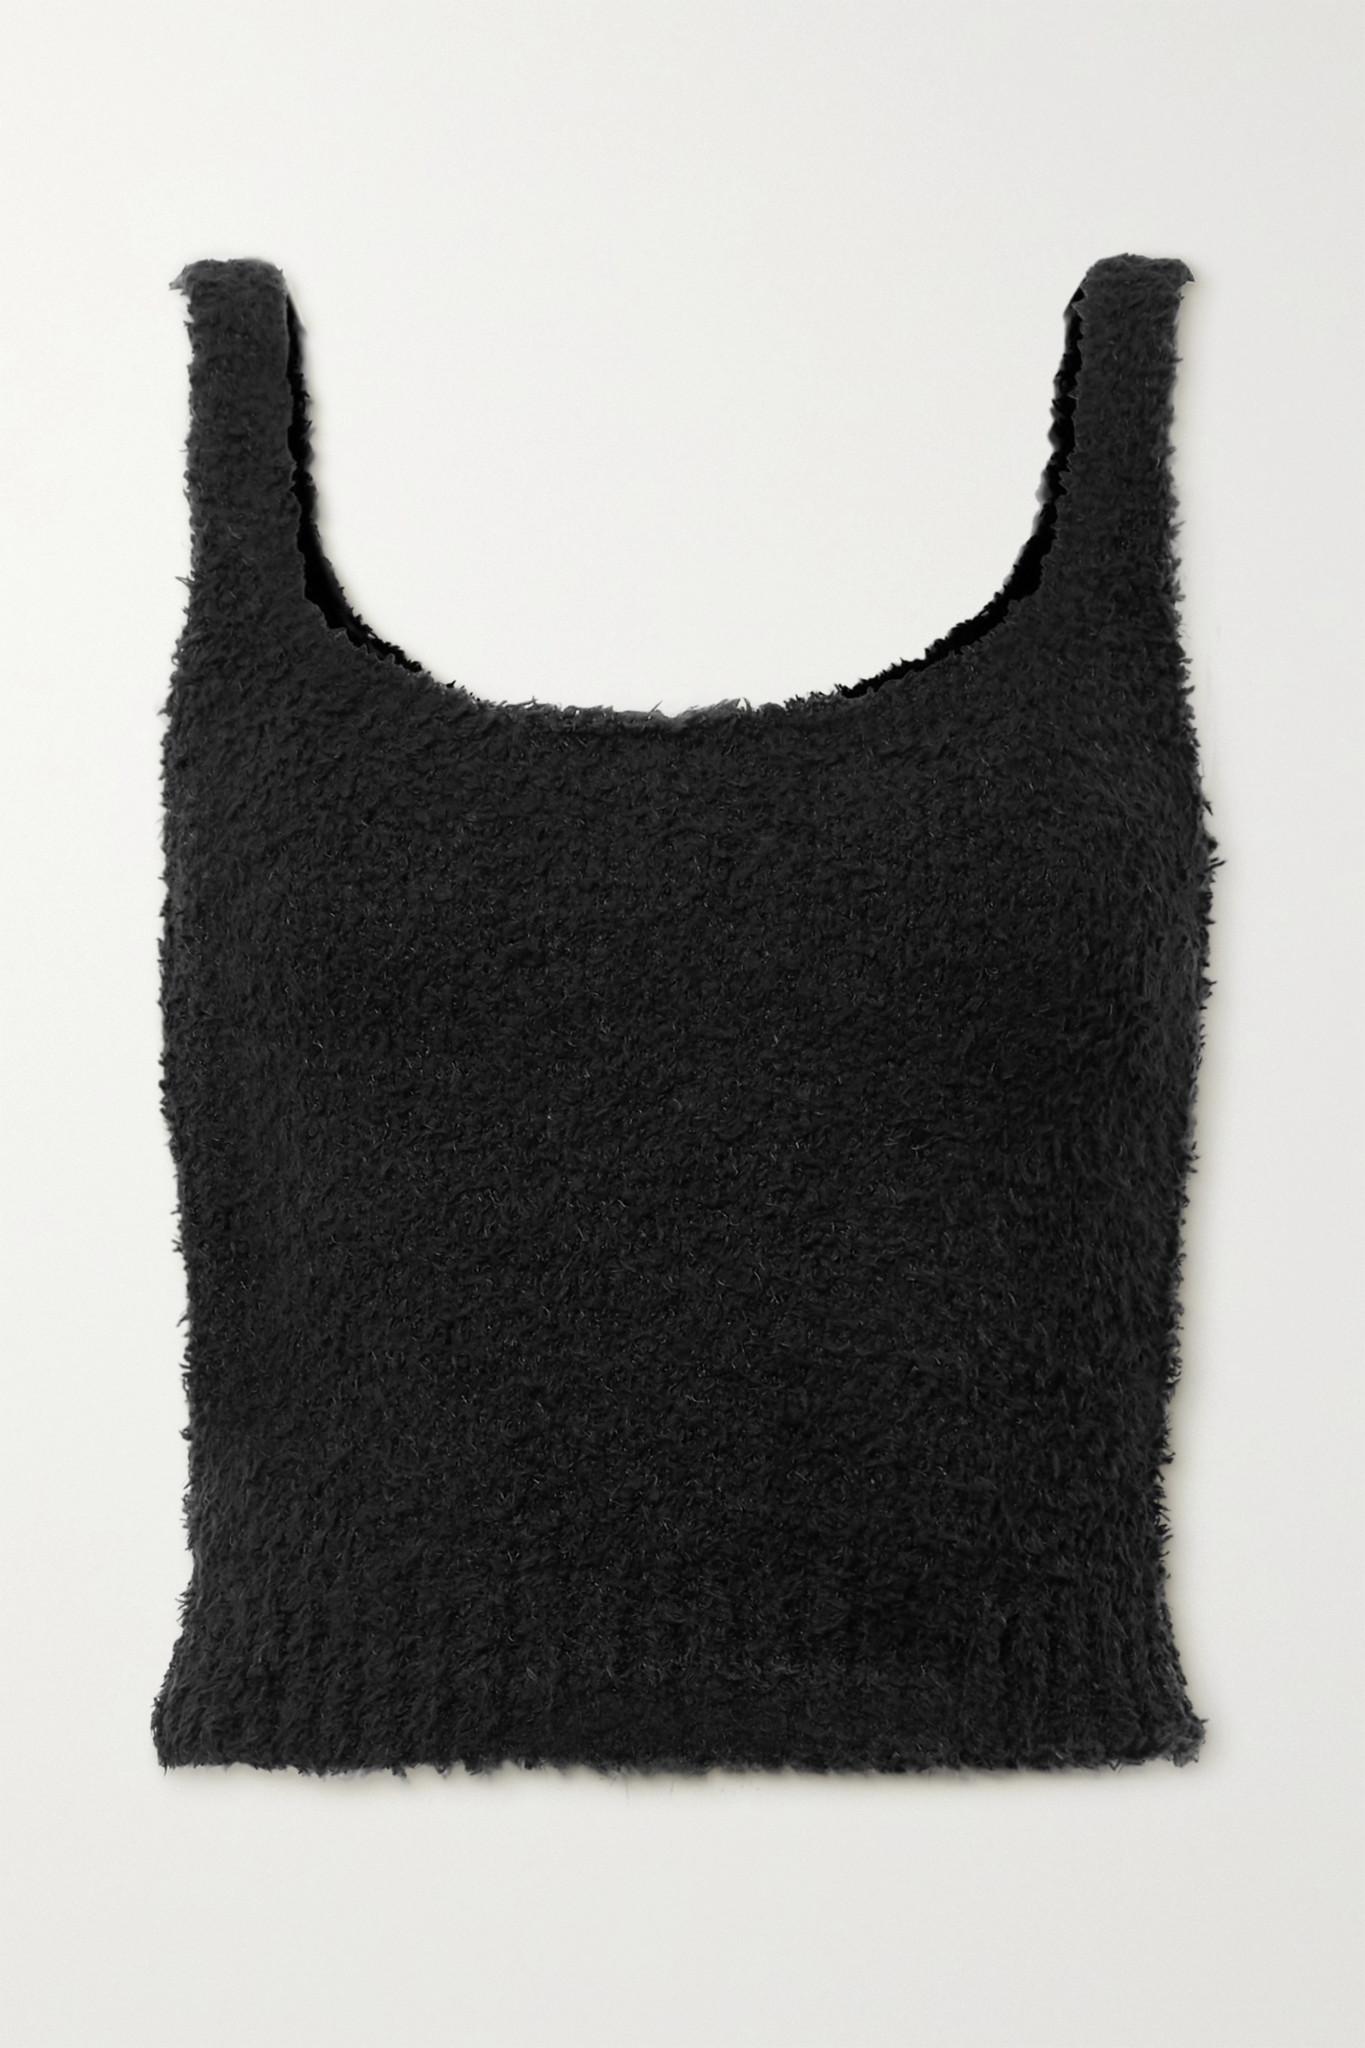 SKIMS - Cozy Knit Bouclé Tank - Onyx - Black - L/XL